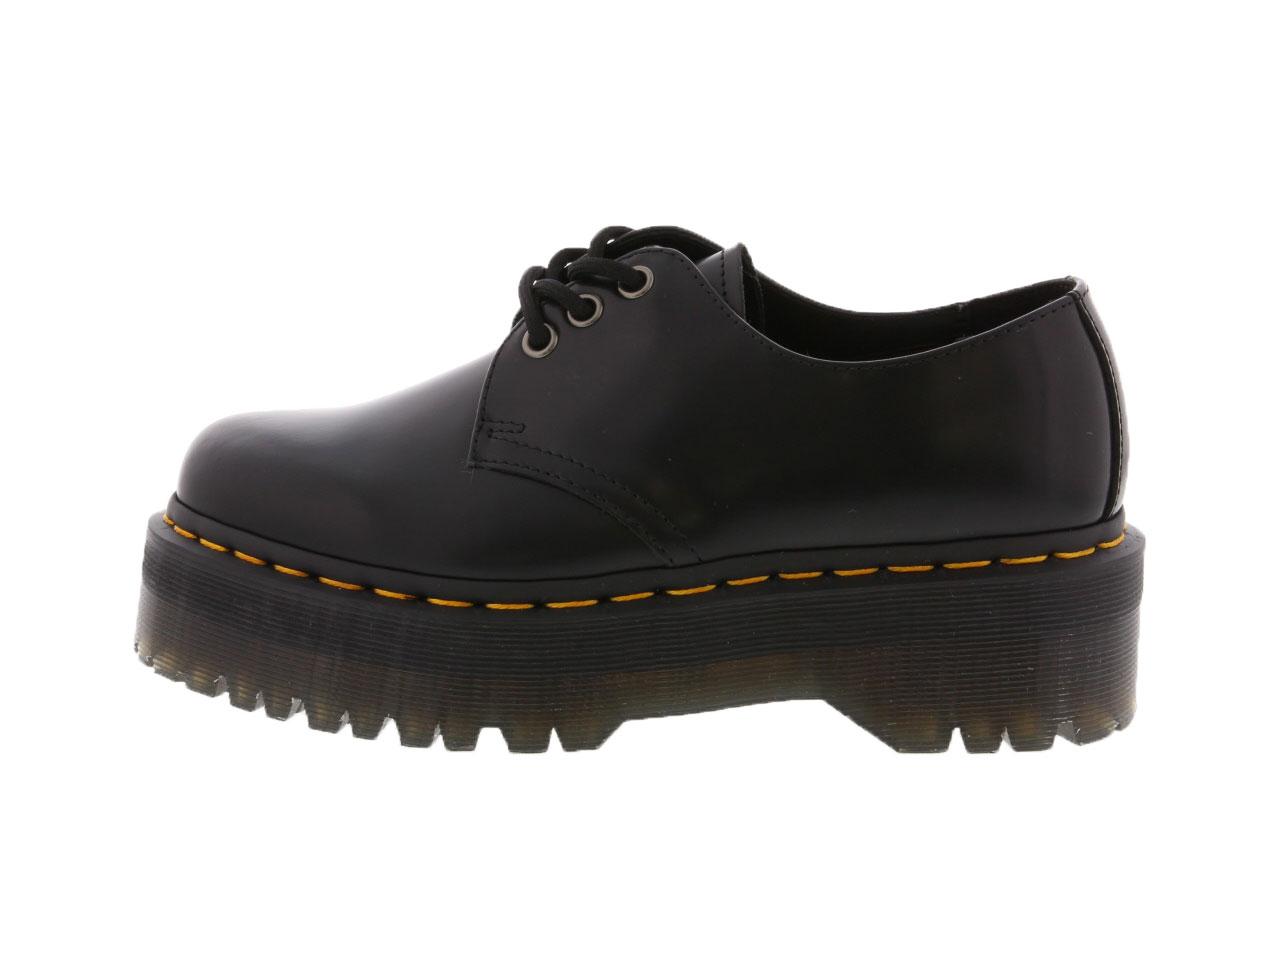 Dr.Martens 1461 QUAD(25567001)【ドクターマーチン】【メンズファッション】【レディースファッション】【シューズ】【ブーツ】【靴】【フットウェア】